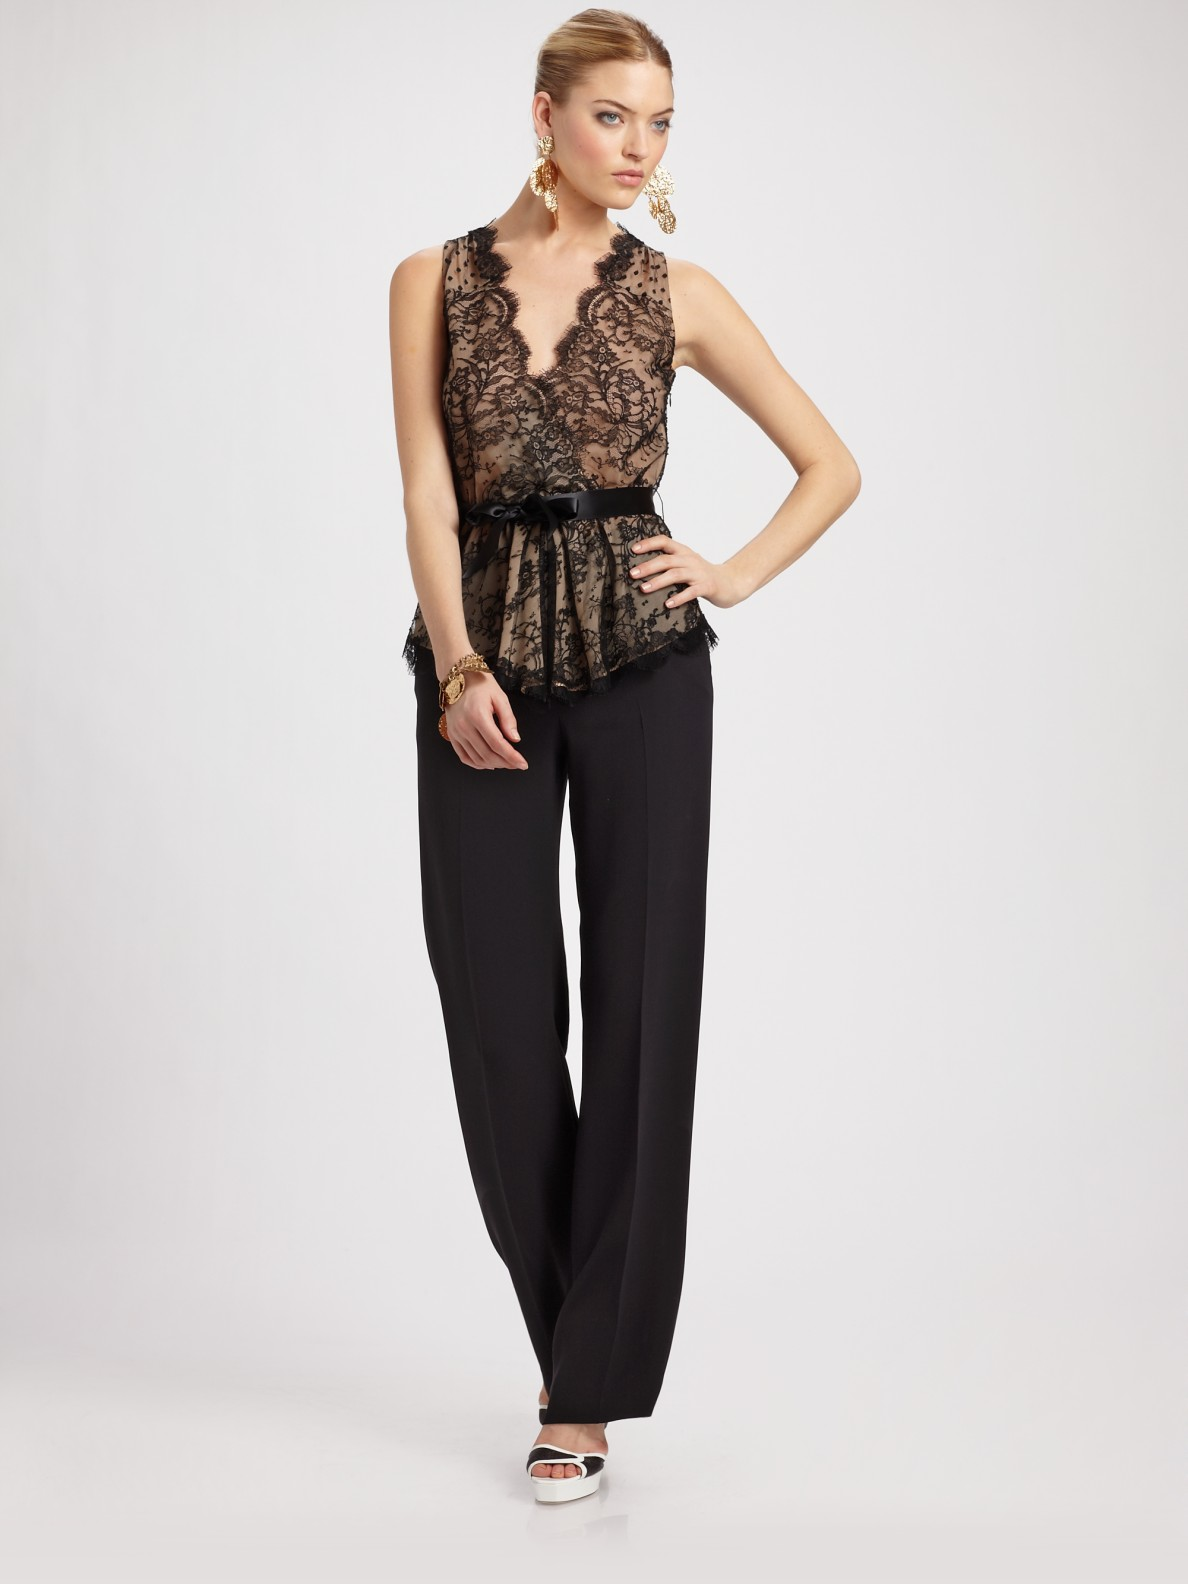 6021a139657f4 Oscar de la renta V-neck Lace Blouse in Black